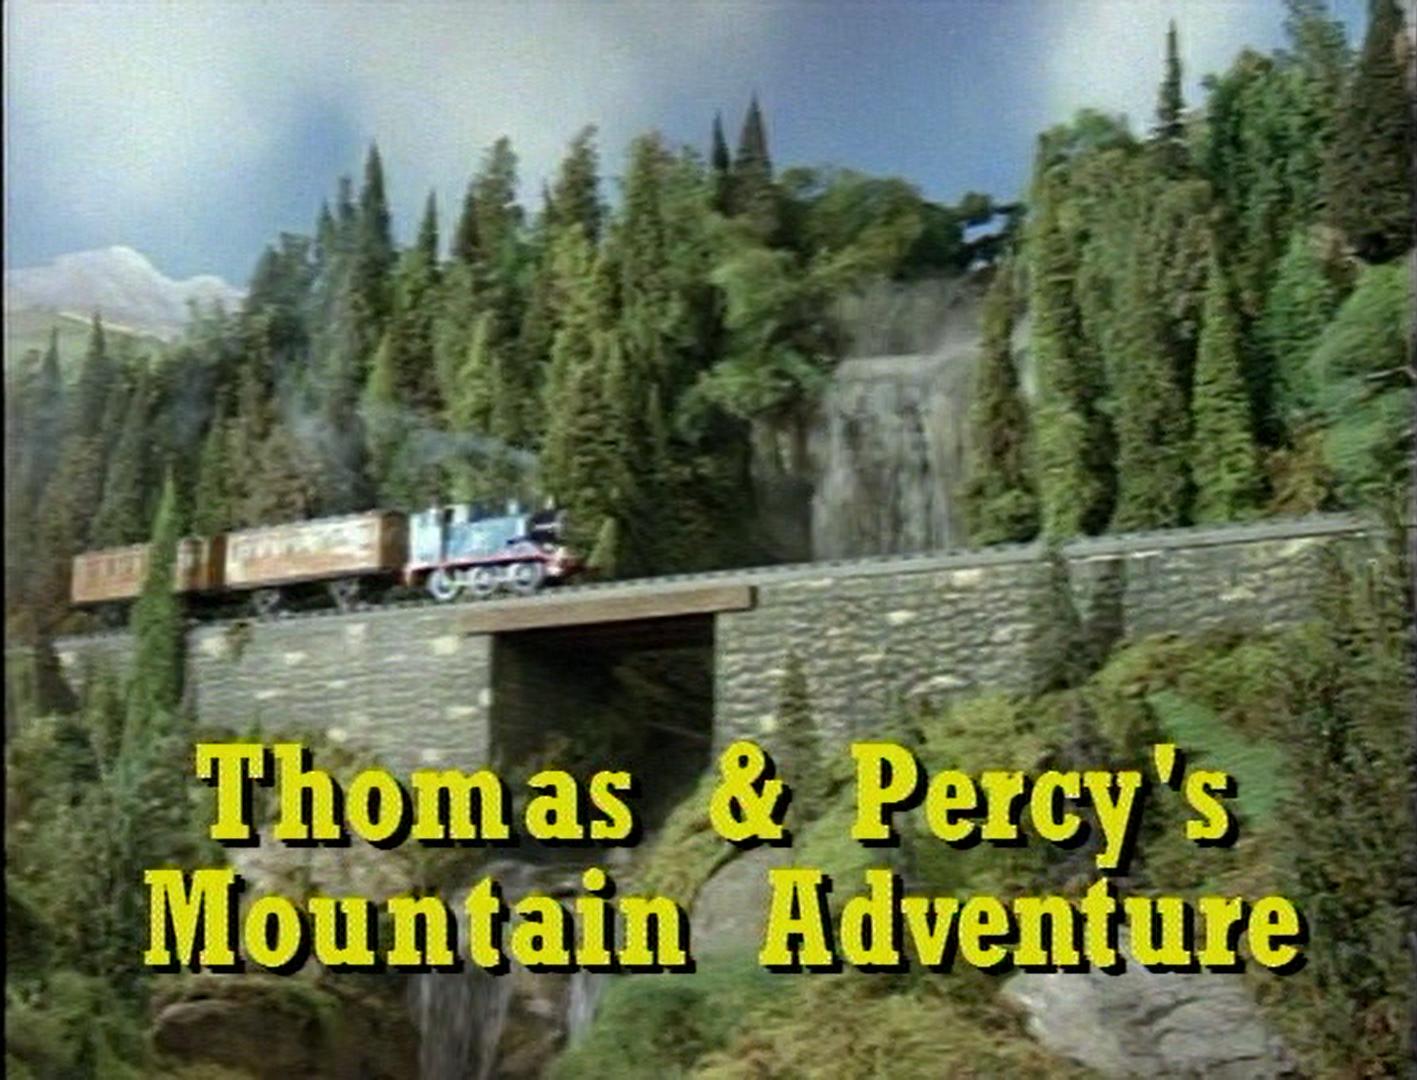 File:ThomasandPercy'sMountainAdventuretitlecard.png